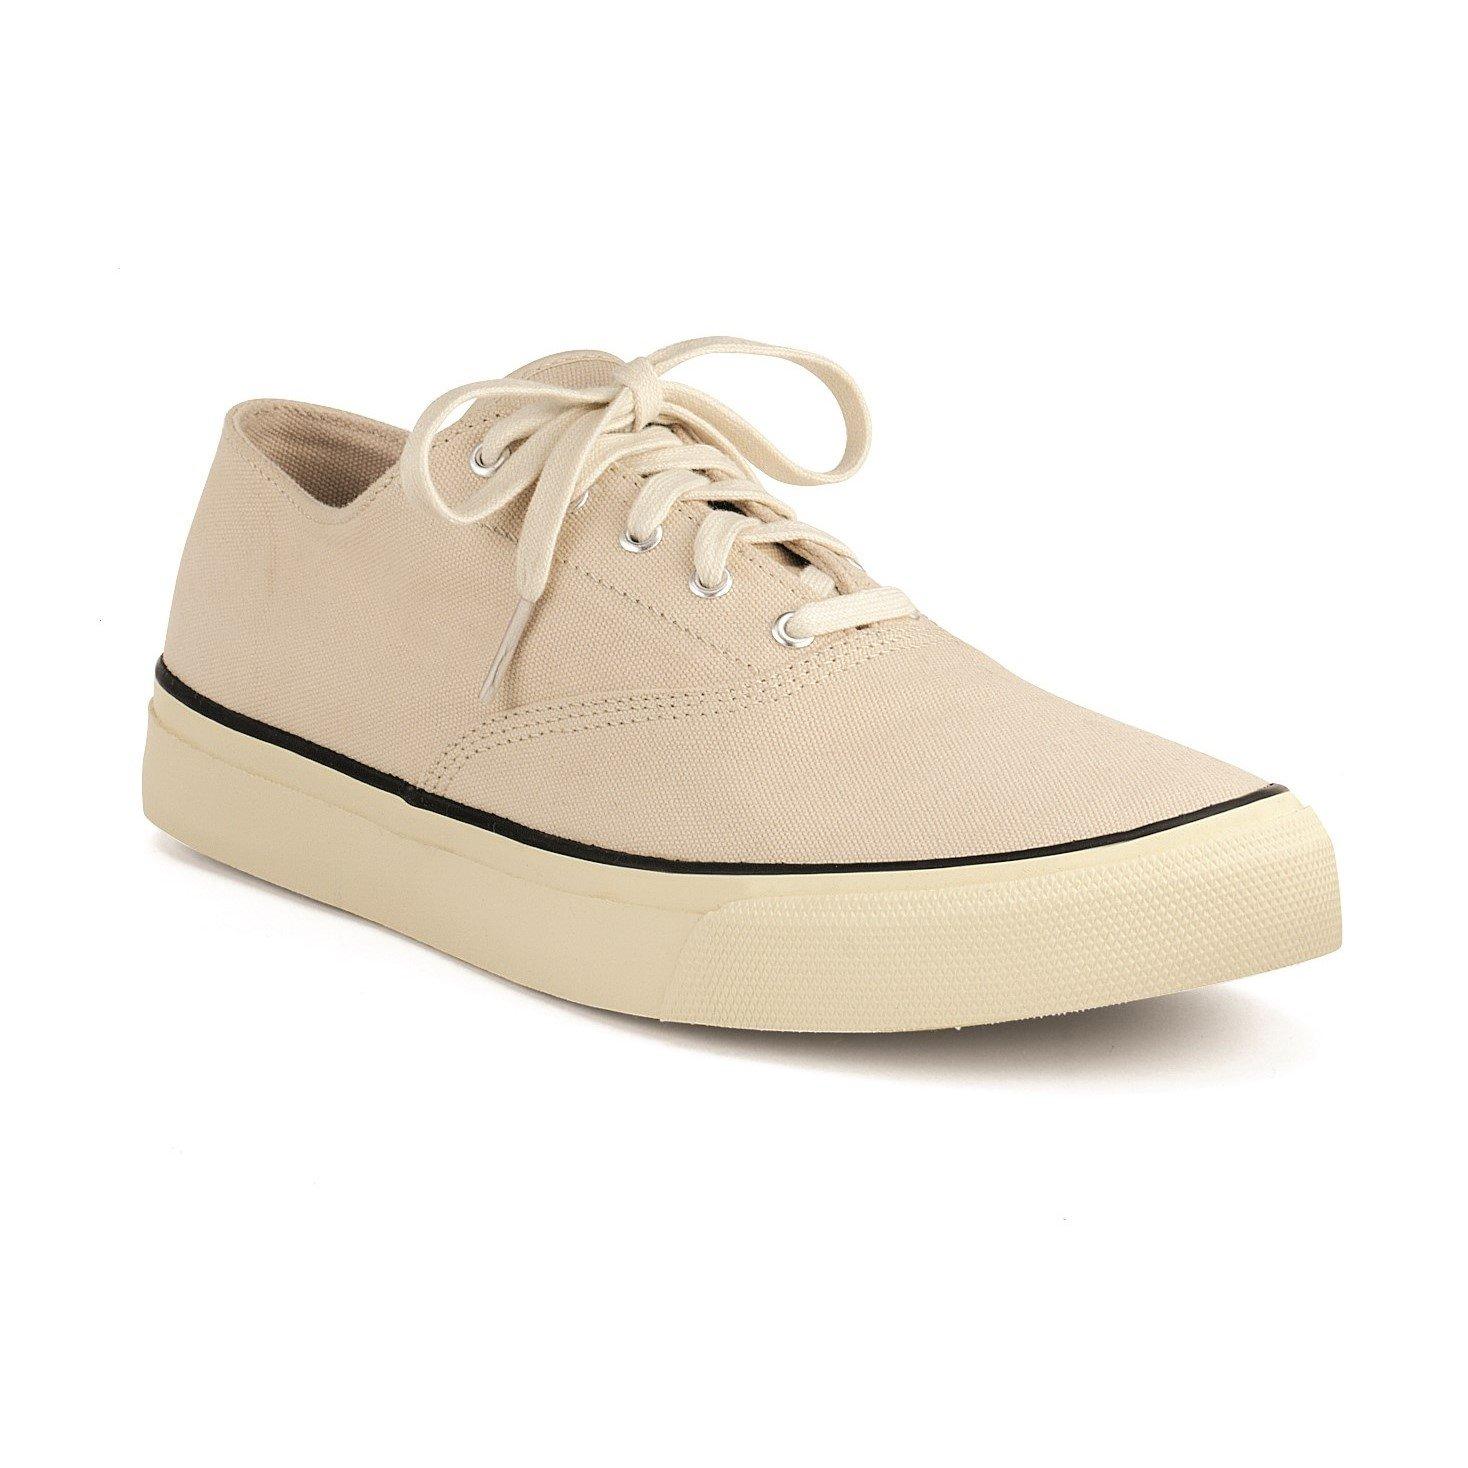 Sperry Men's Cloud CVO Boat Shoe Various Colours 33537 - White 7